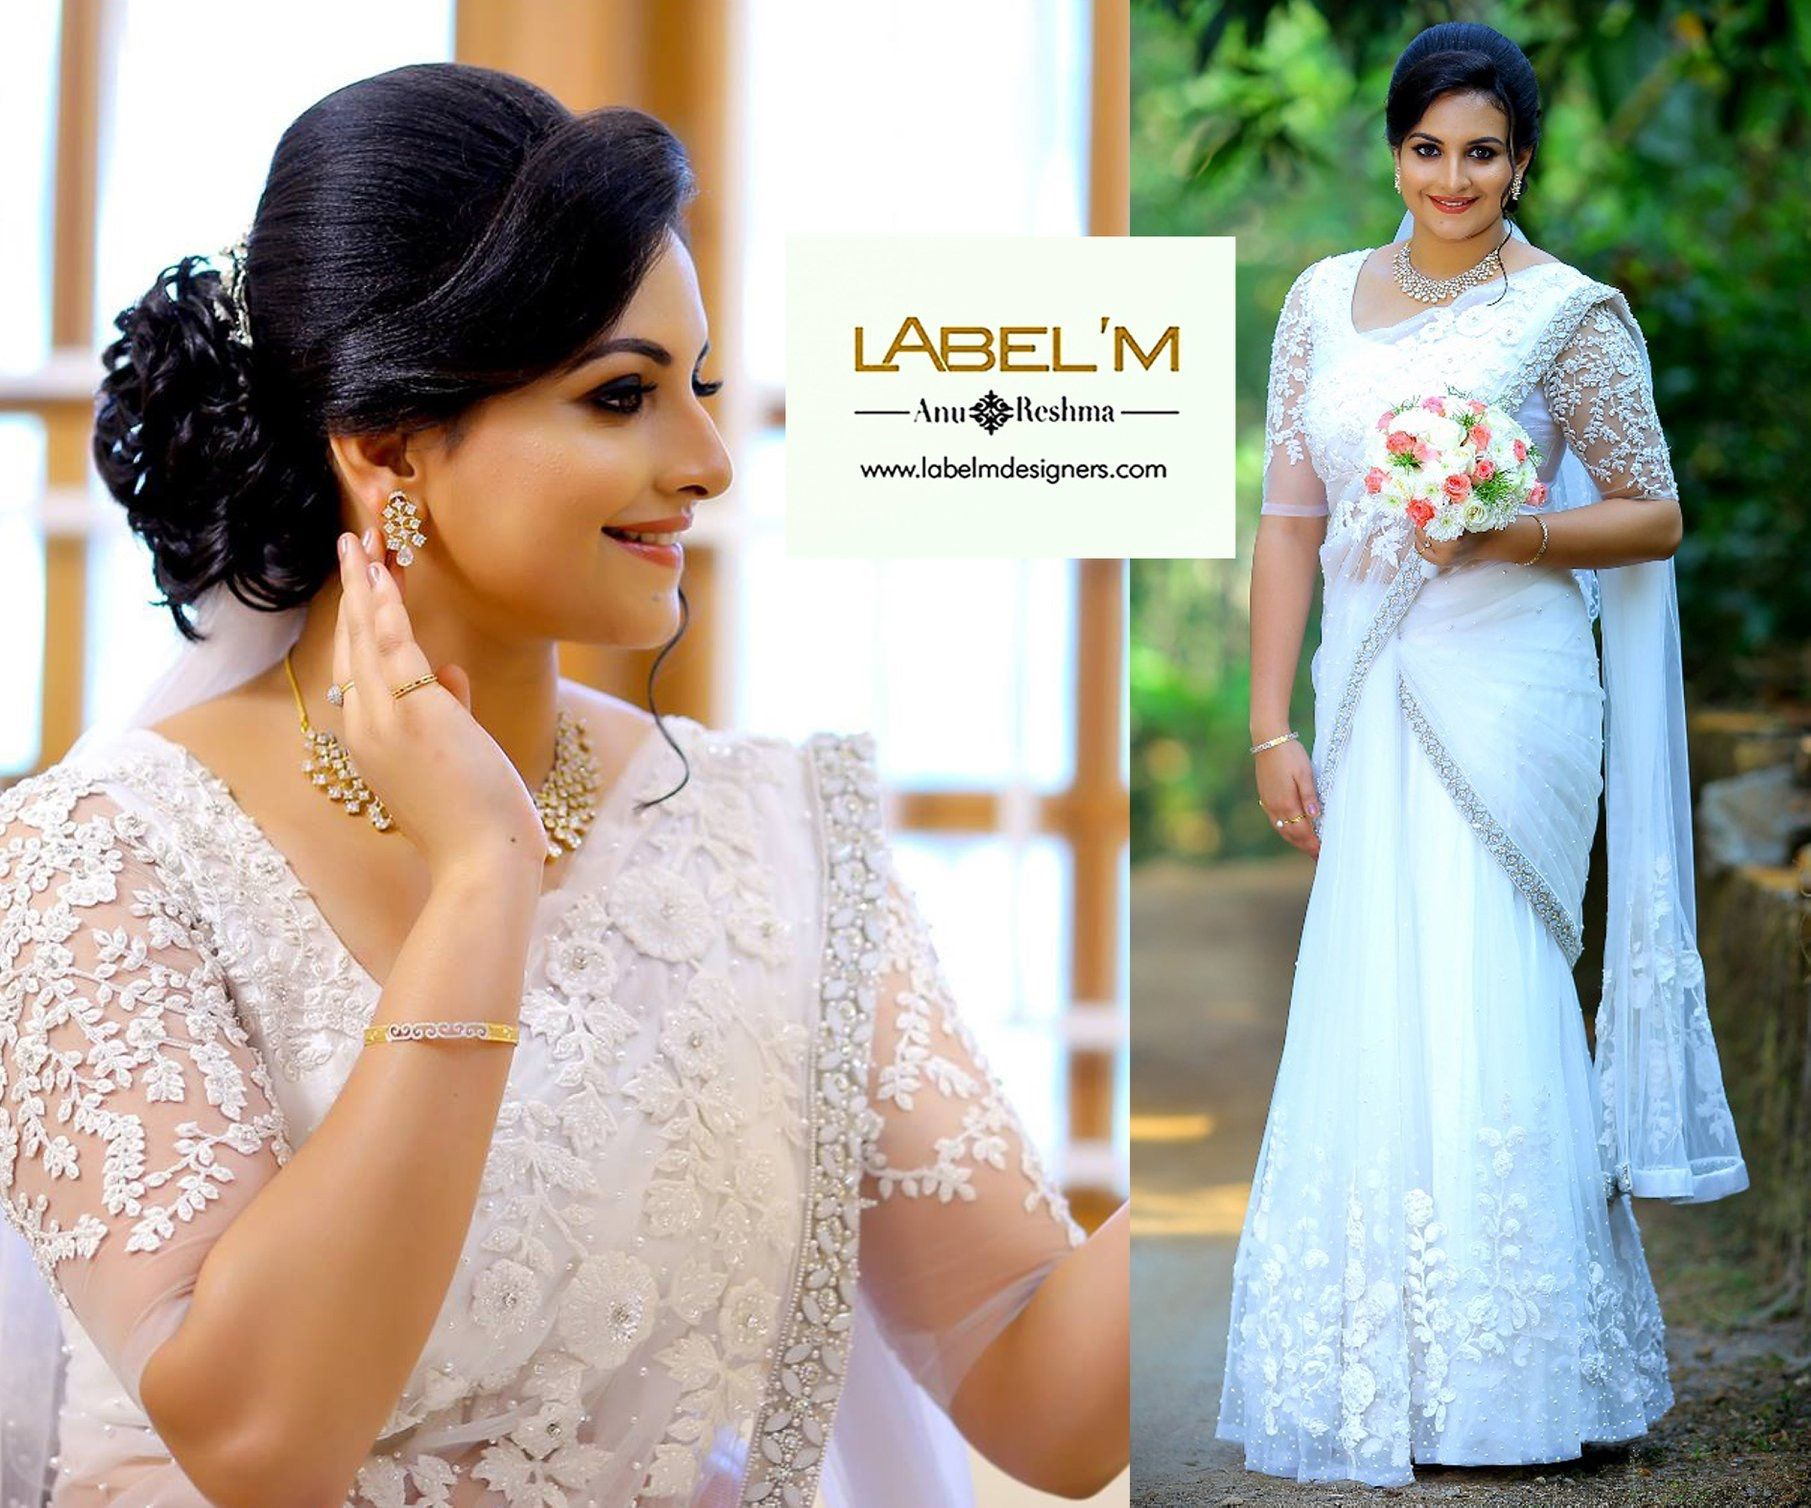 Pin By Tresa Shipi On Wedding Stuff Christian Bride Christian Wedding Gowns Christian Bridal Saree